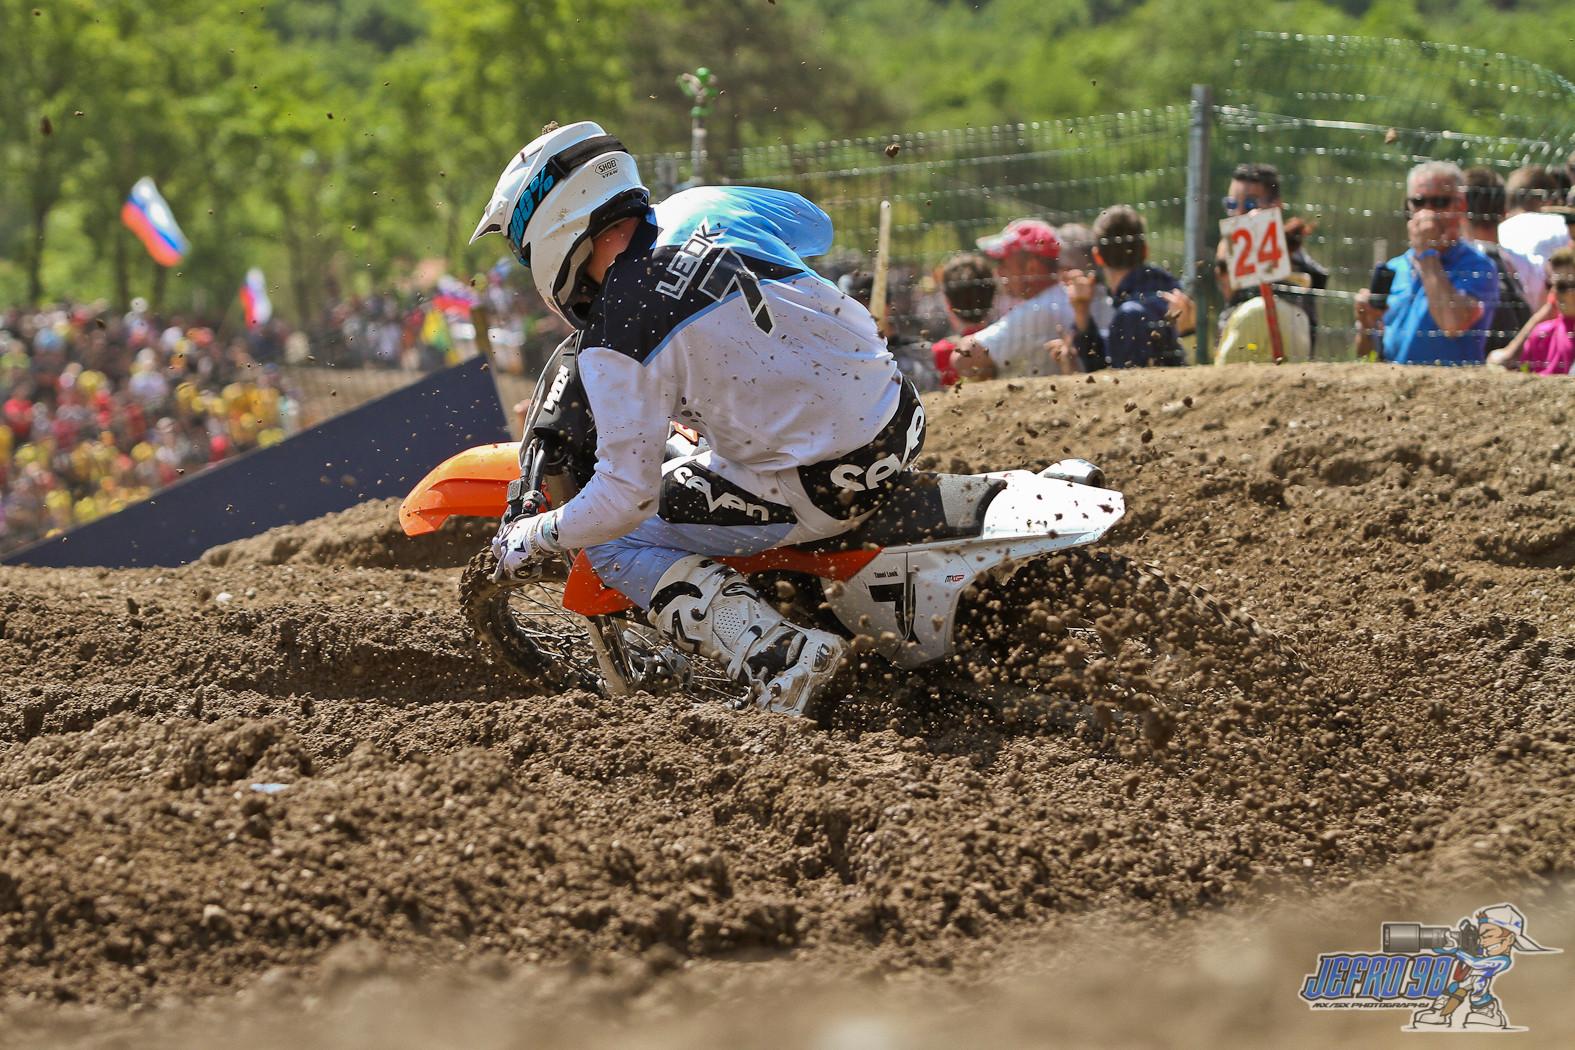 Tanel Leok - Photo Gallery: MXGP of Trentino, Italy - Motocross Pictures - Vital MX